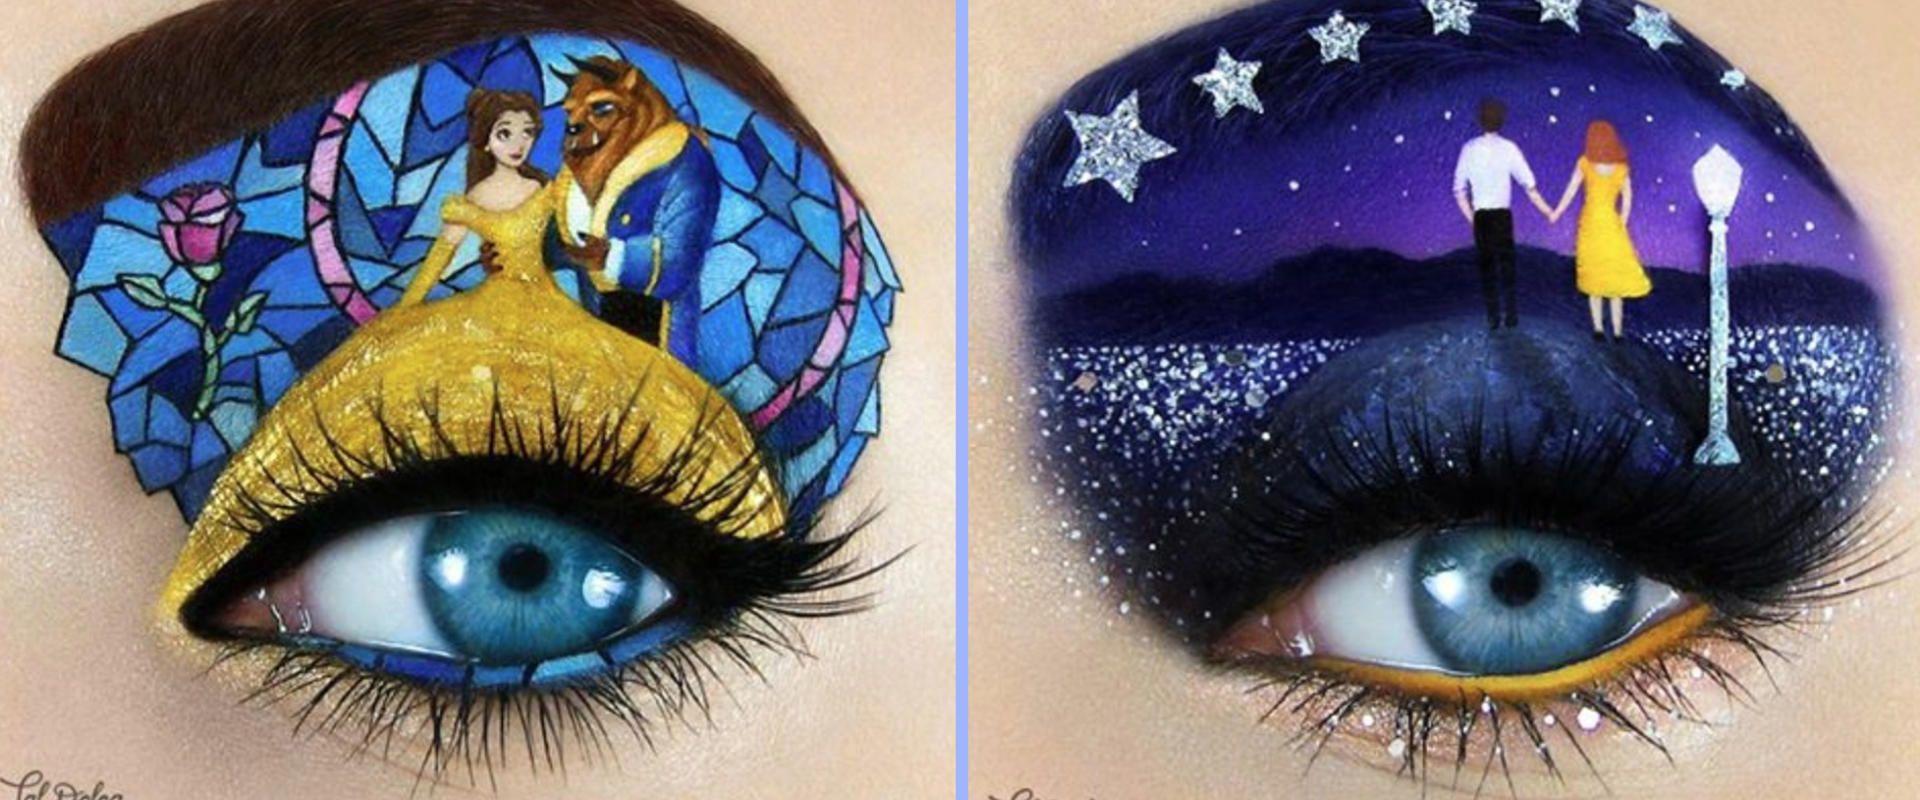 Beauty and the Beast Tal Peleg Makeup